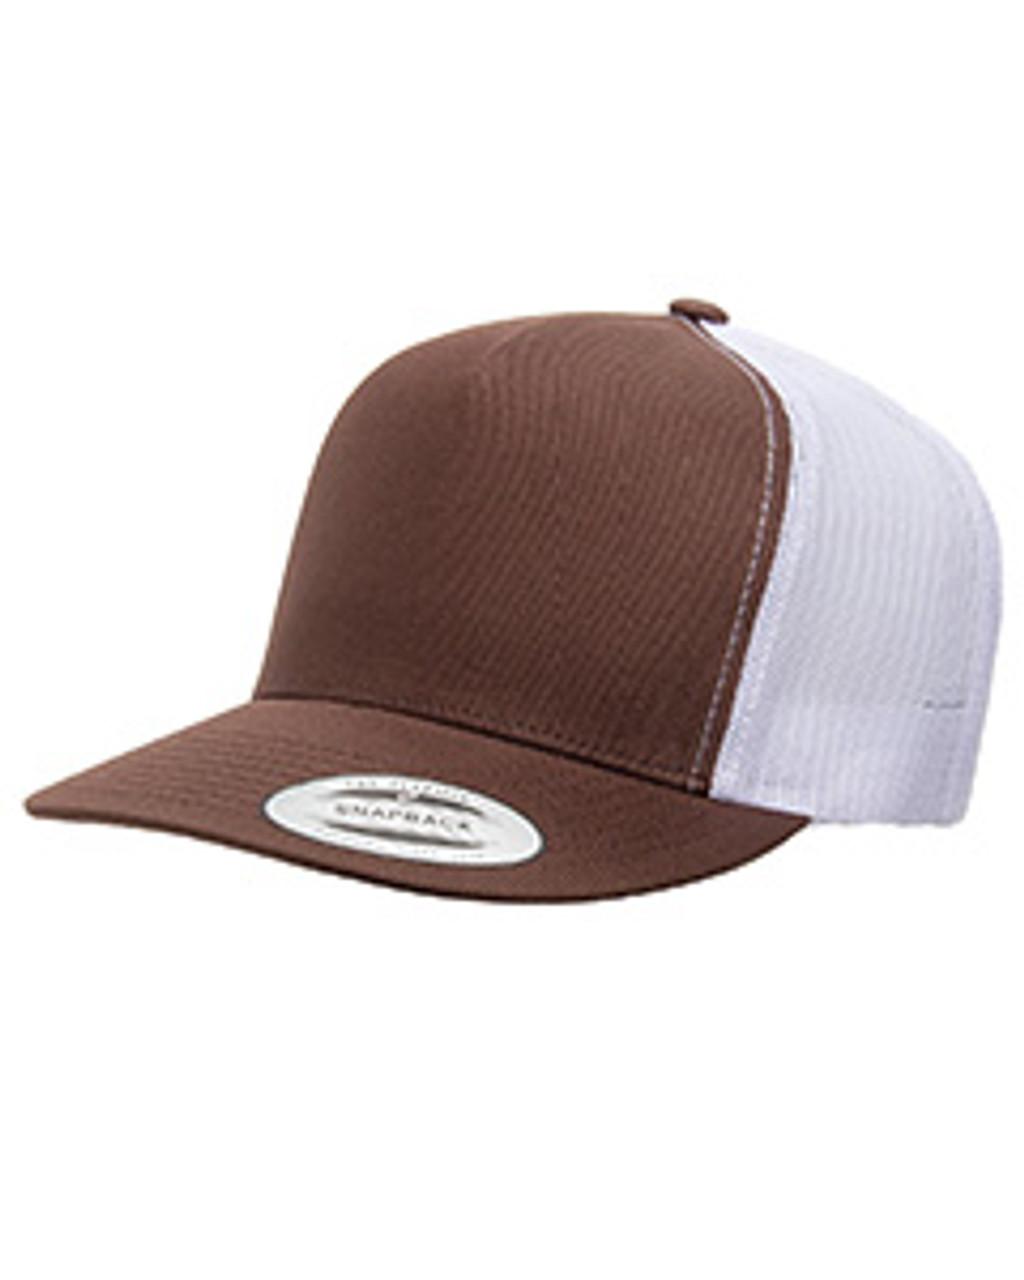 Yupoong - Classic Flat Bill Trucker Cap